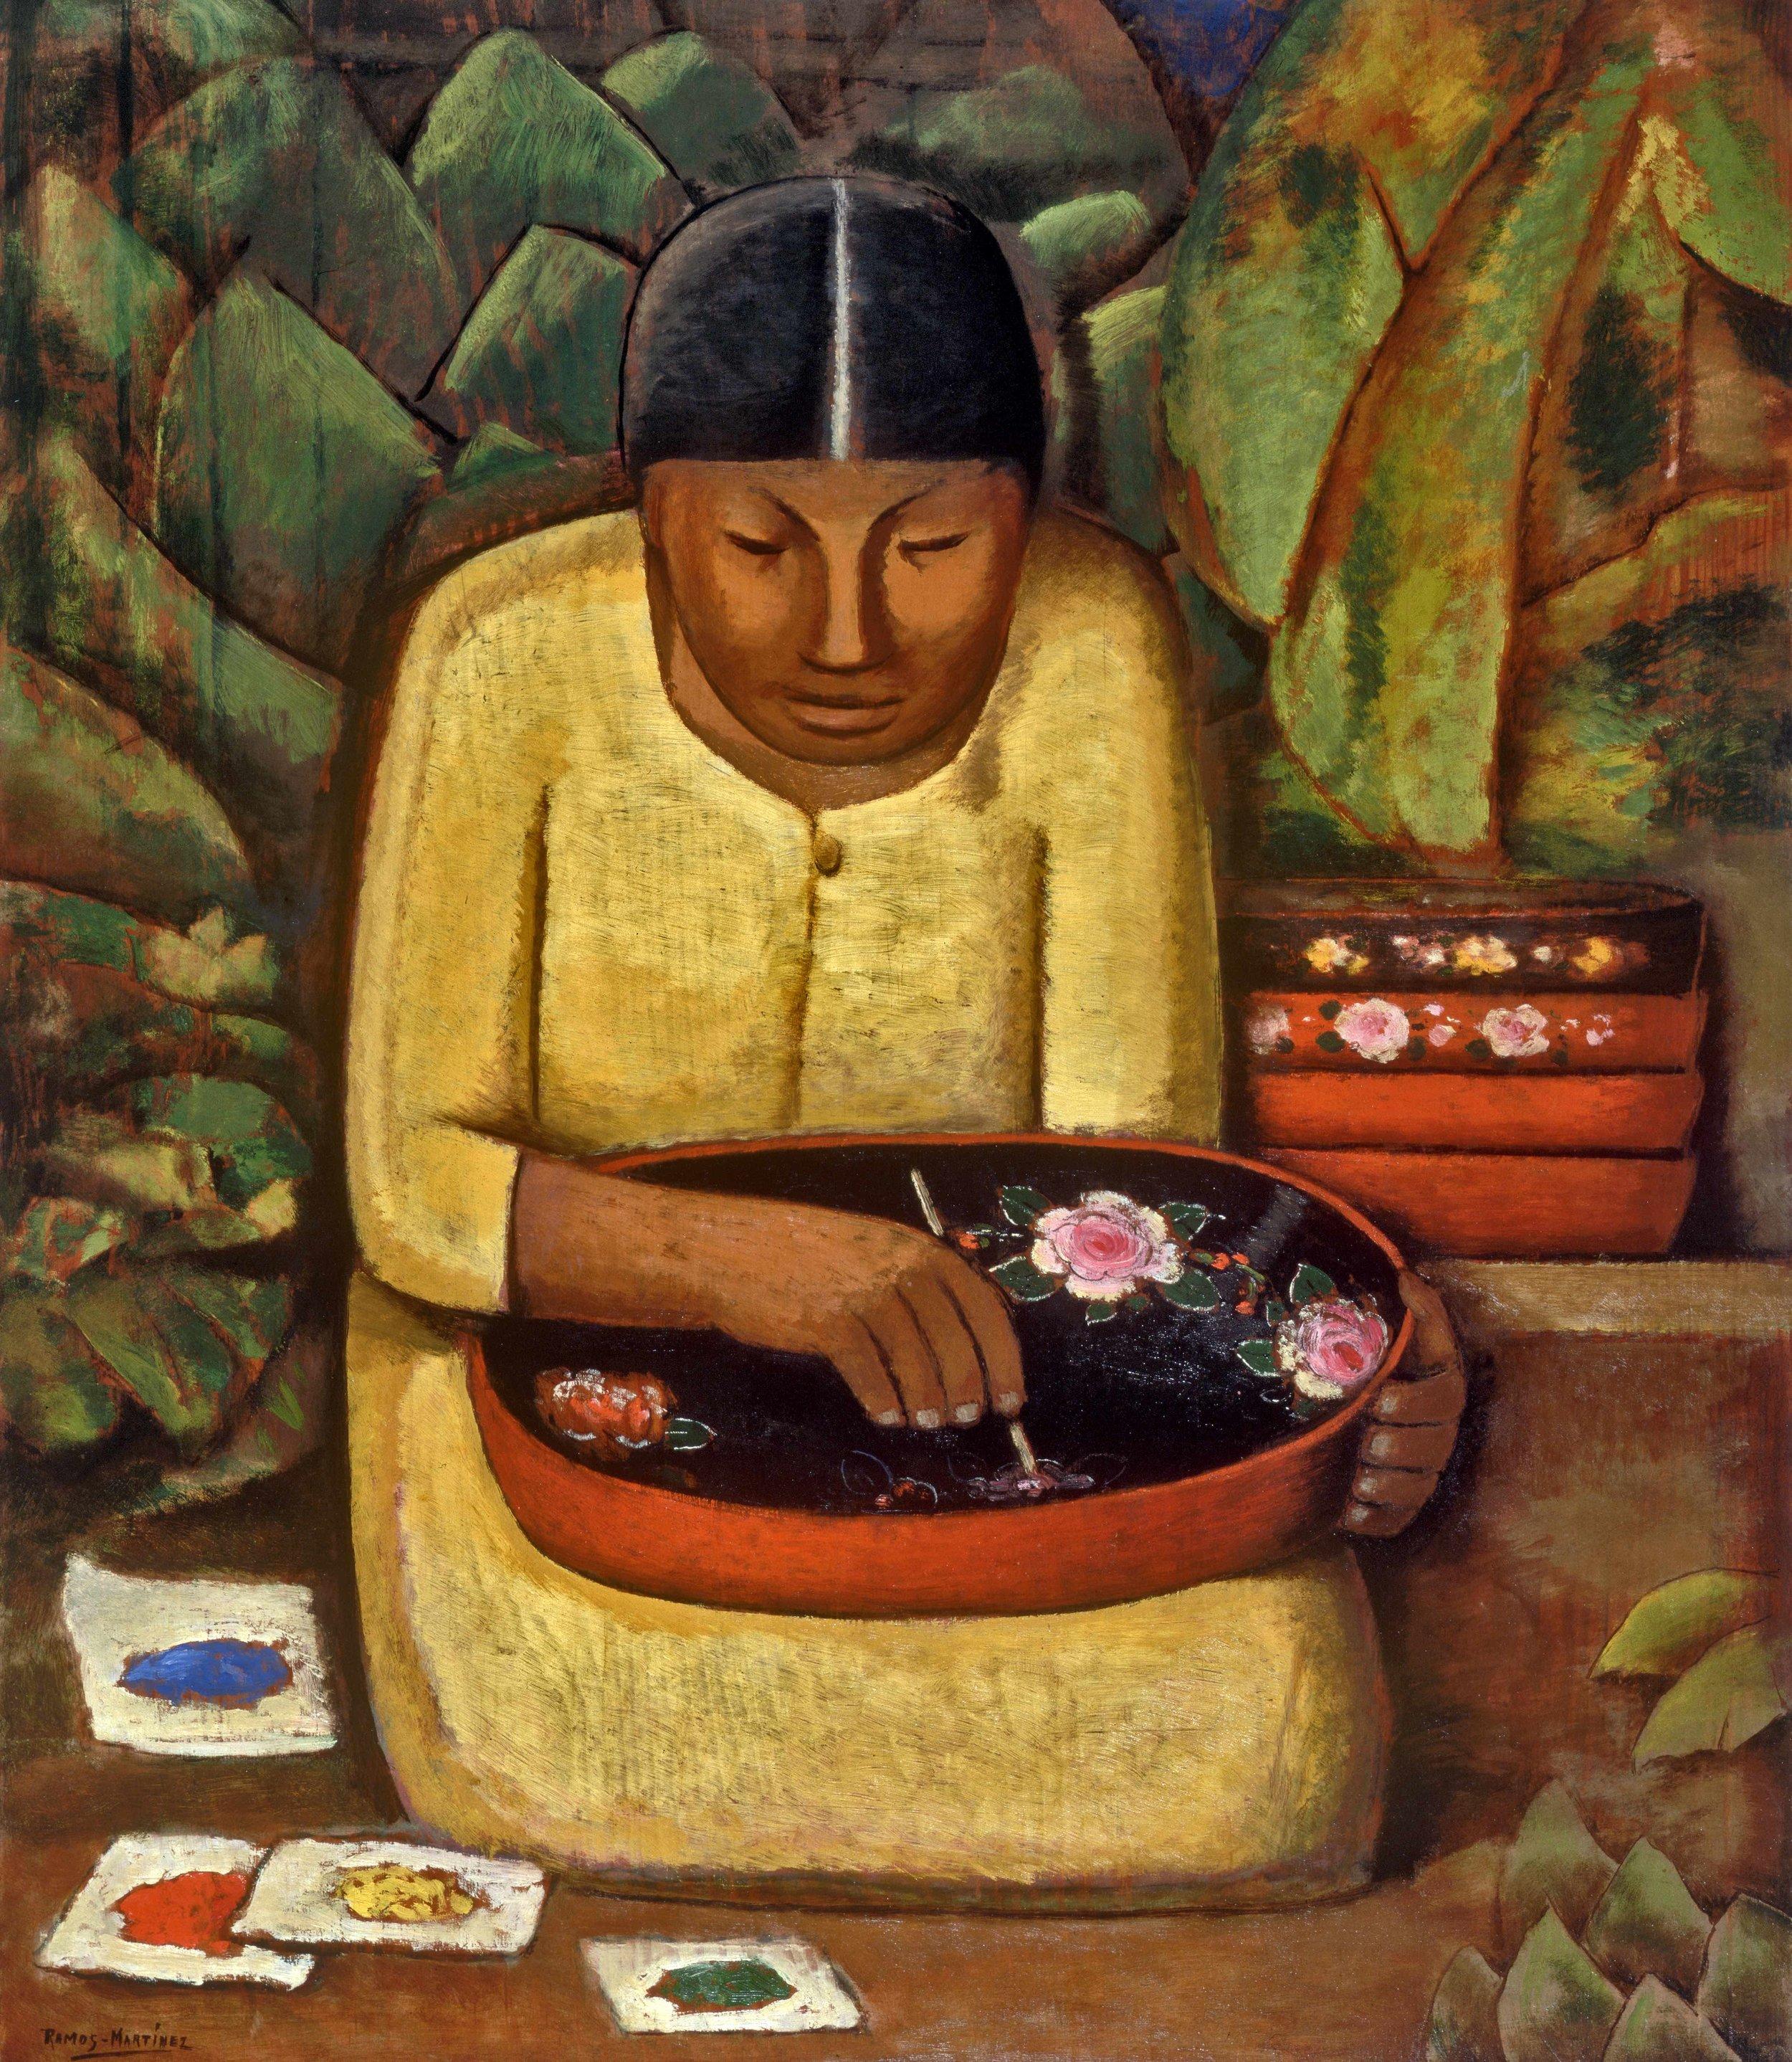 La Pintora de Uruapan / Uruapan Painter  ca. 1930 oil on board / óleo sobre tabla 28 x 24 inches; 71.1 x 61 centímetros Santa Barbara Museum of Art